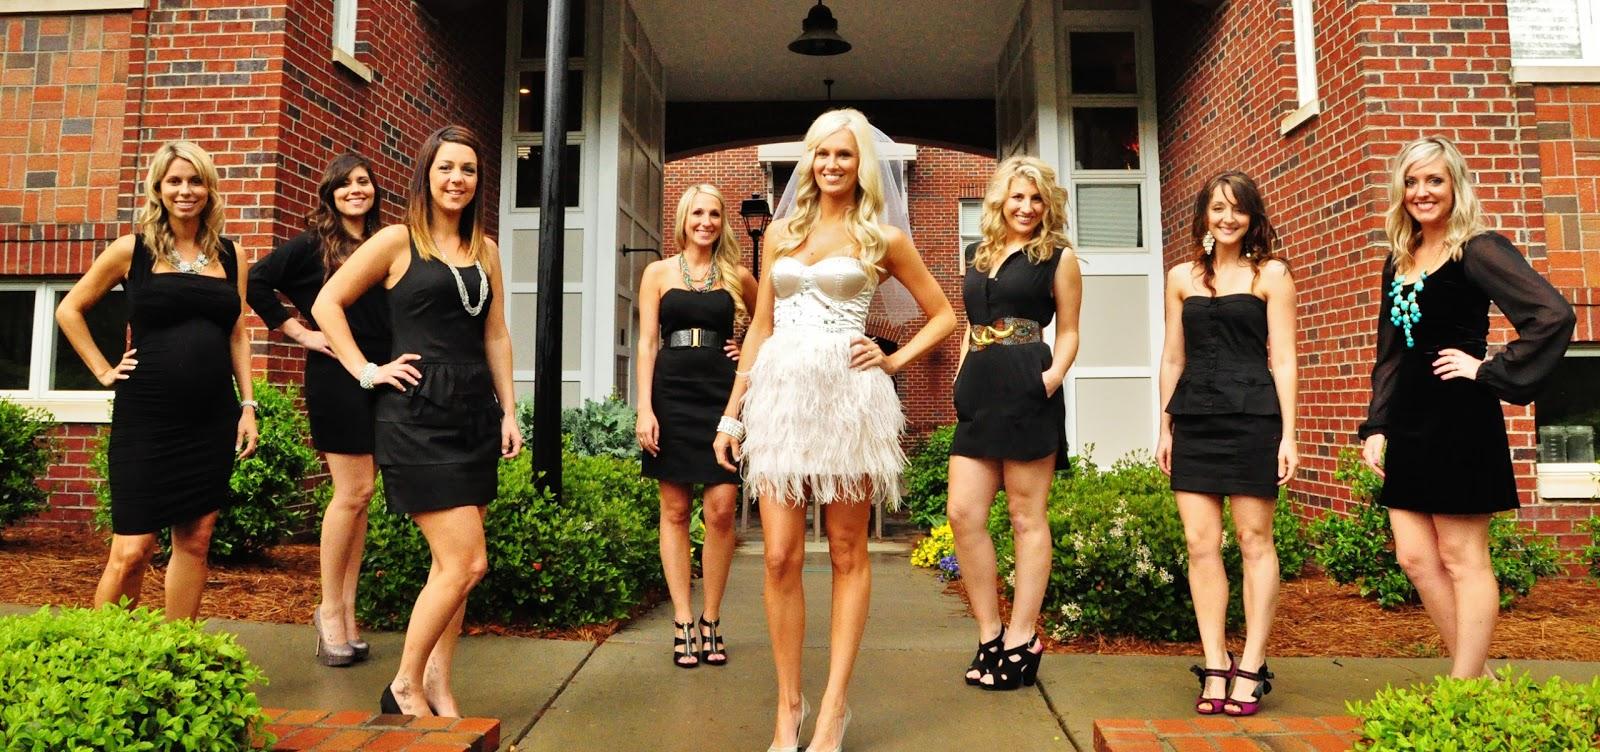 Contemporary Bachelorette Party Bachelorette Party Mckenna Bleu Bachelorette Party Dresses Black Bachelorette Party Dresses Ideas wedding dress Bachelorette Party Dresses